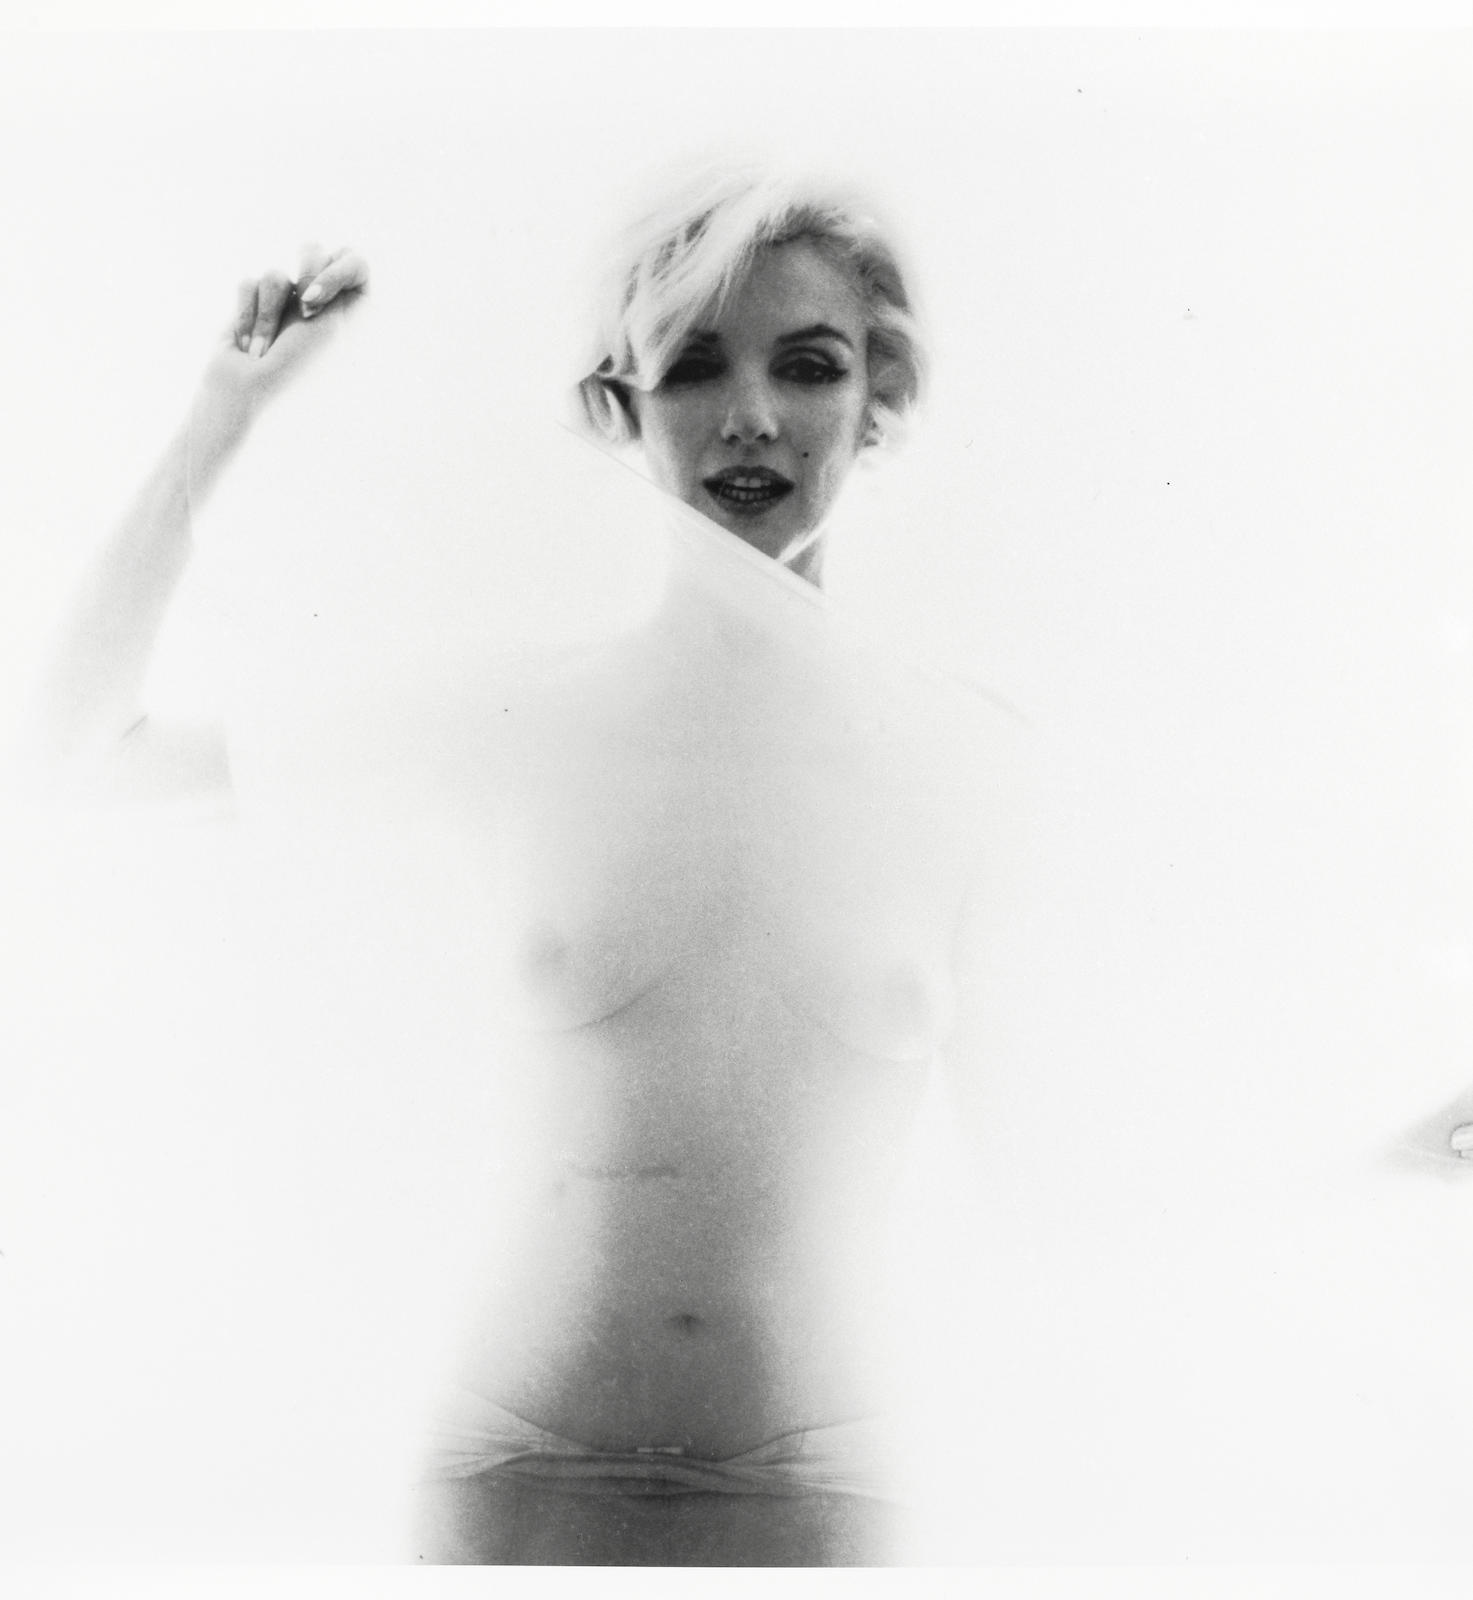 Bernard Stern-After Bert Stern - Marilyn Monroe, from The Last Sitting, for Vogue, 1962-1962